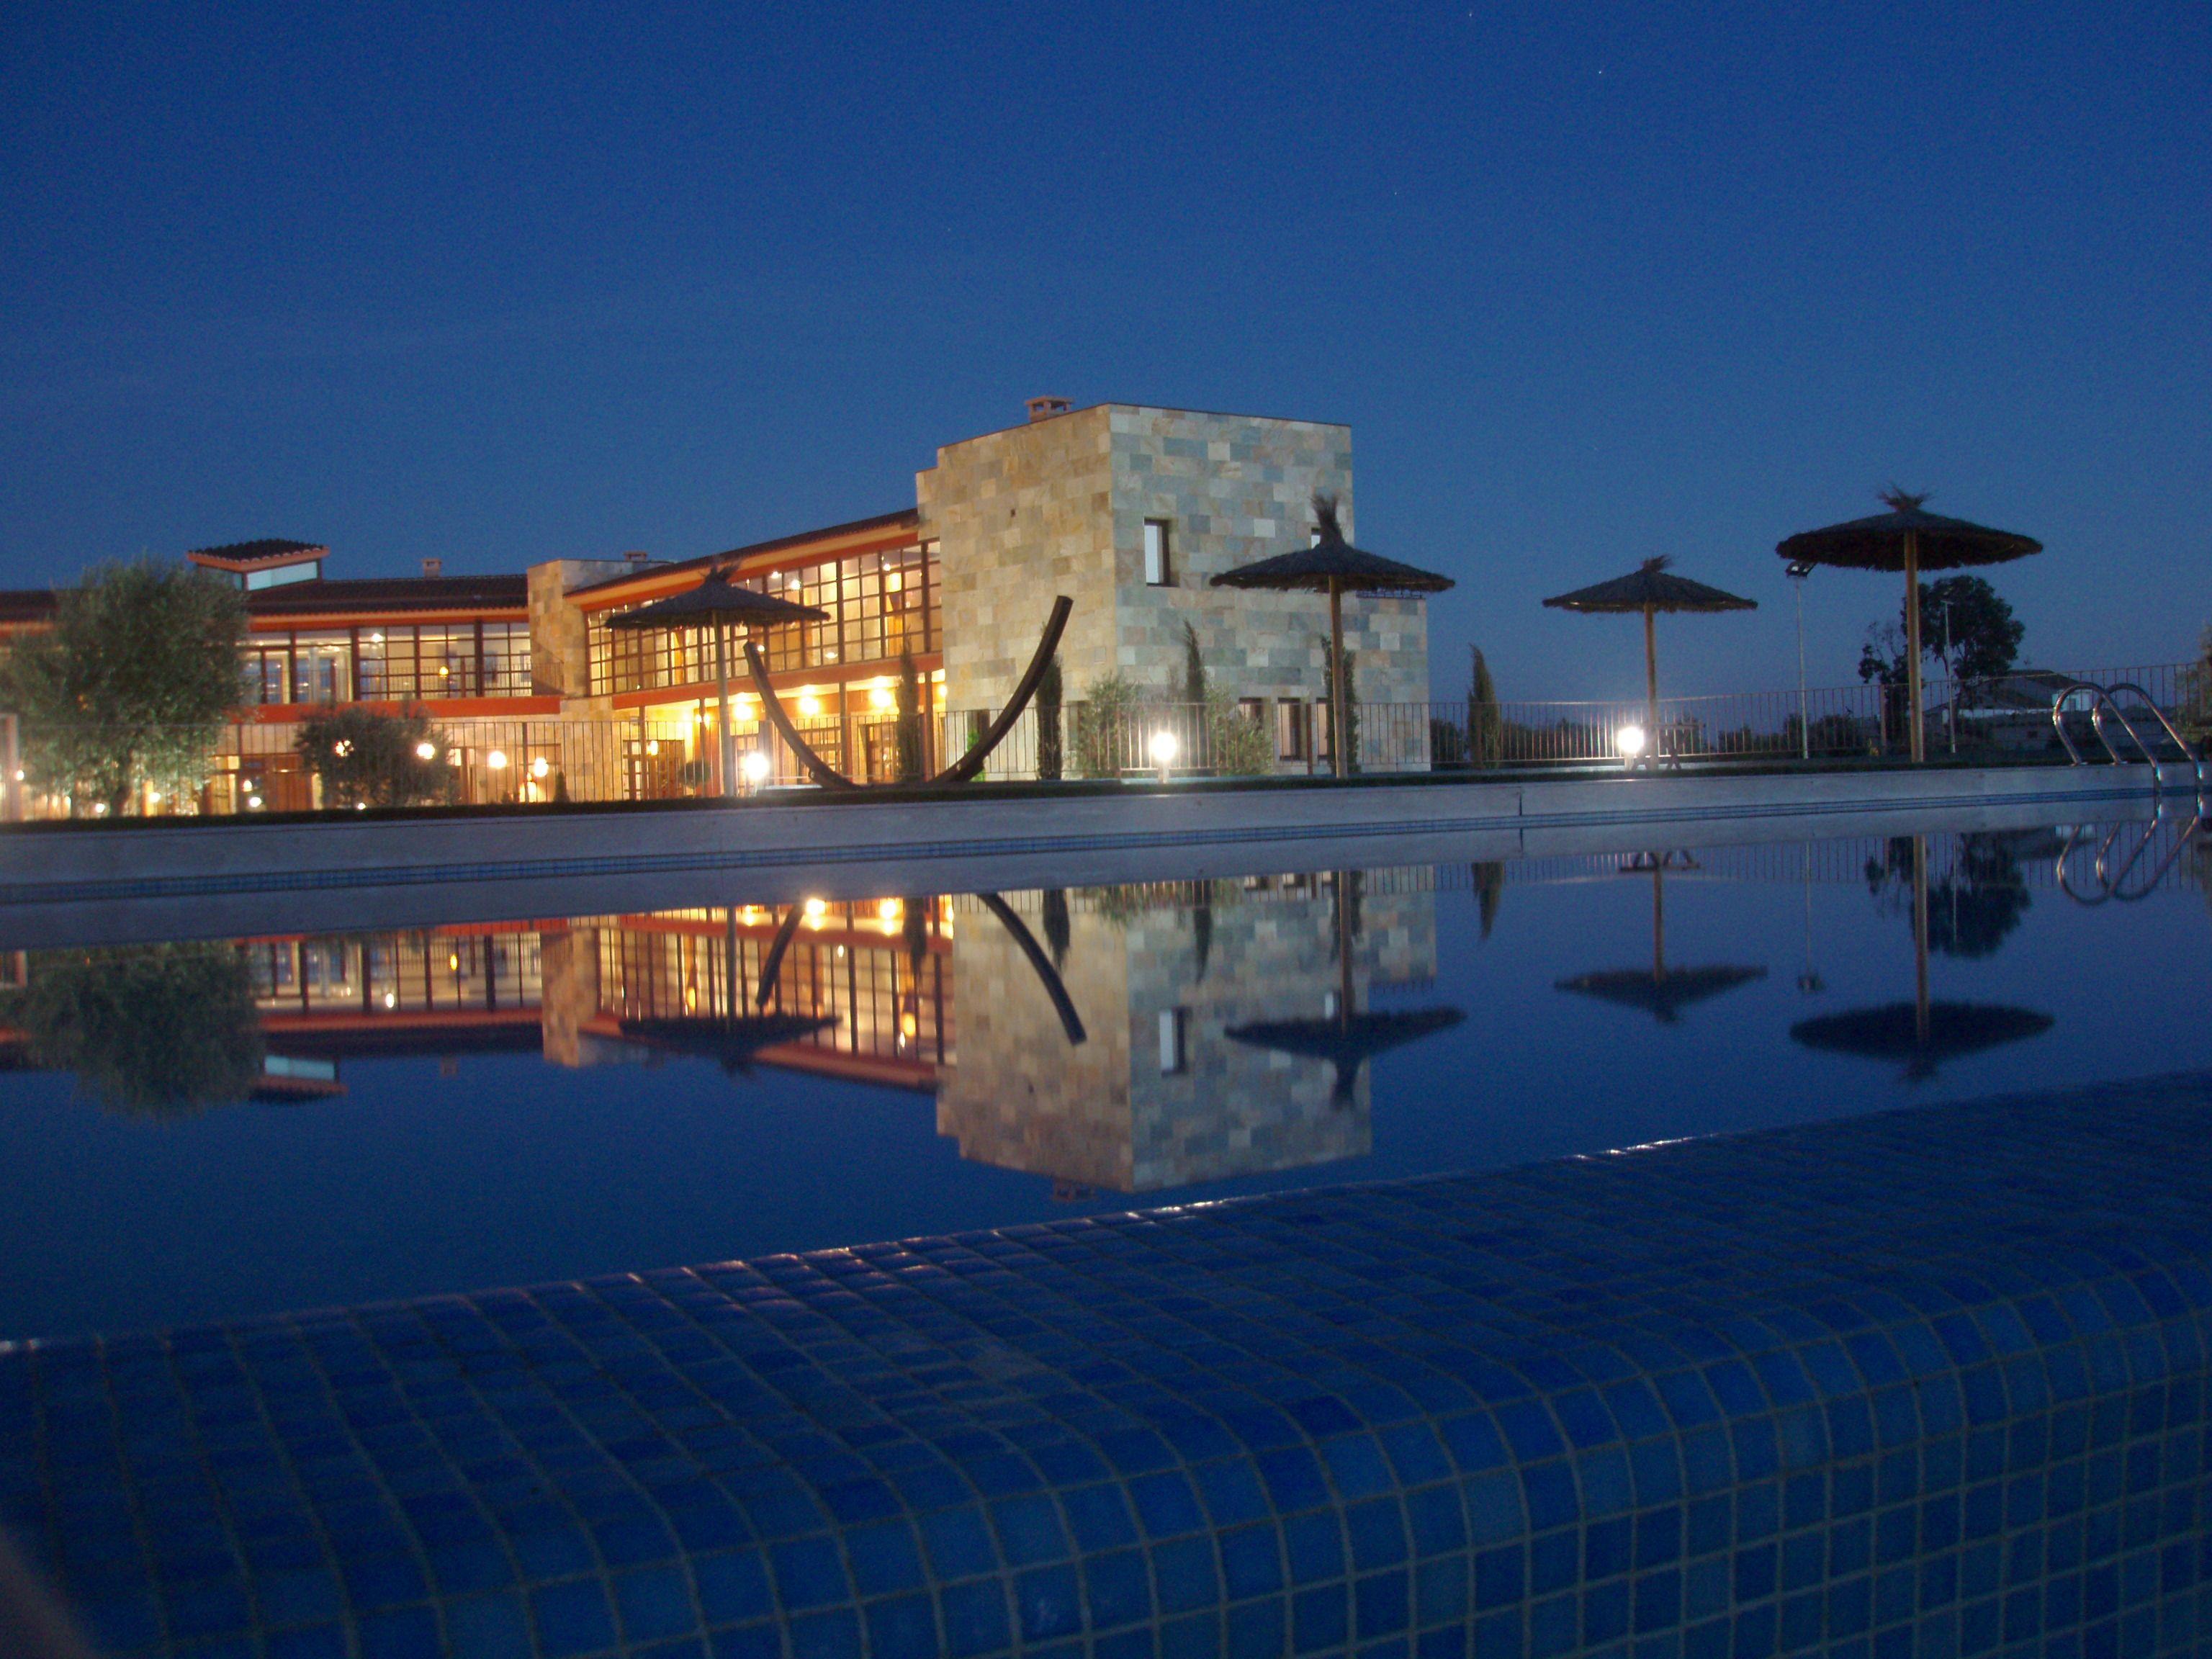 Villa Nazules Hotel Hípica Spa Toledo Spain España Www Villanazules